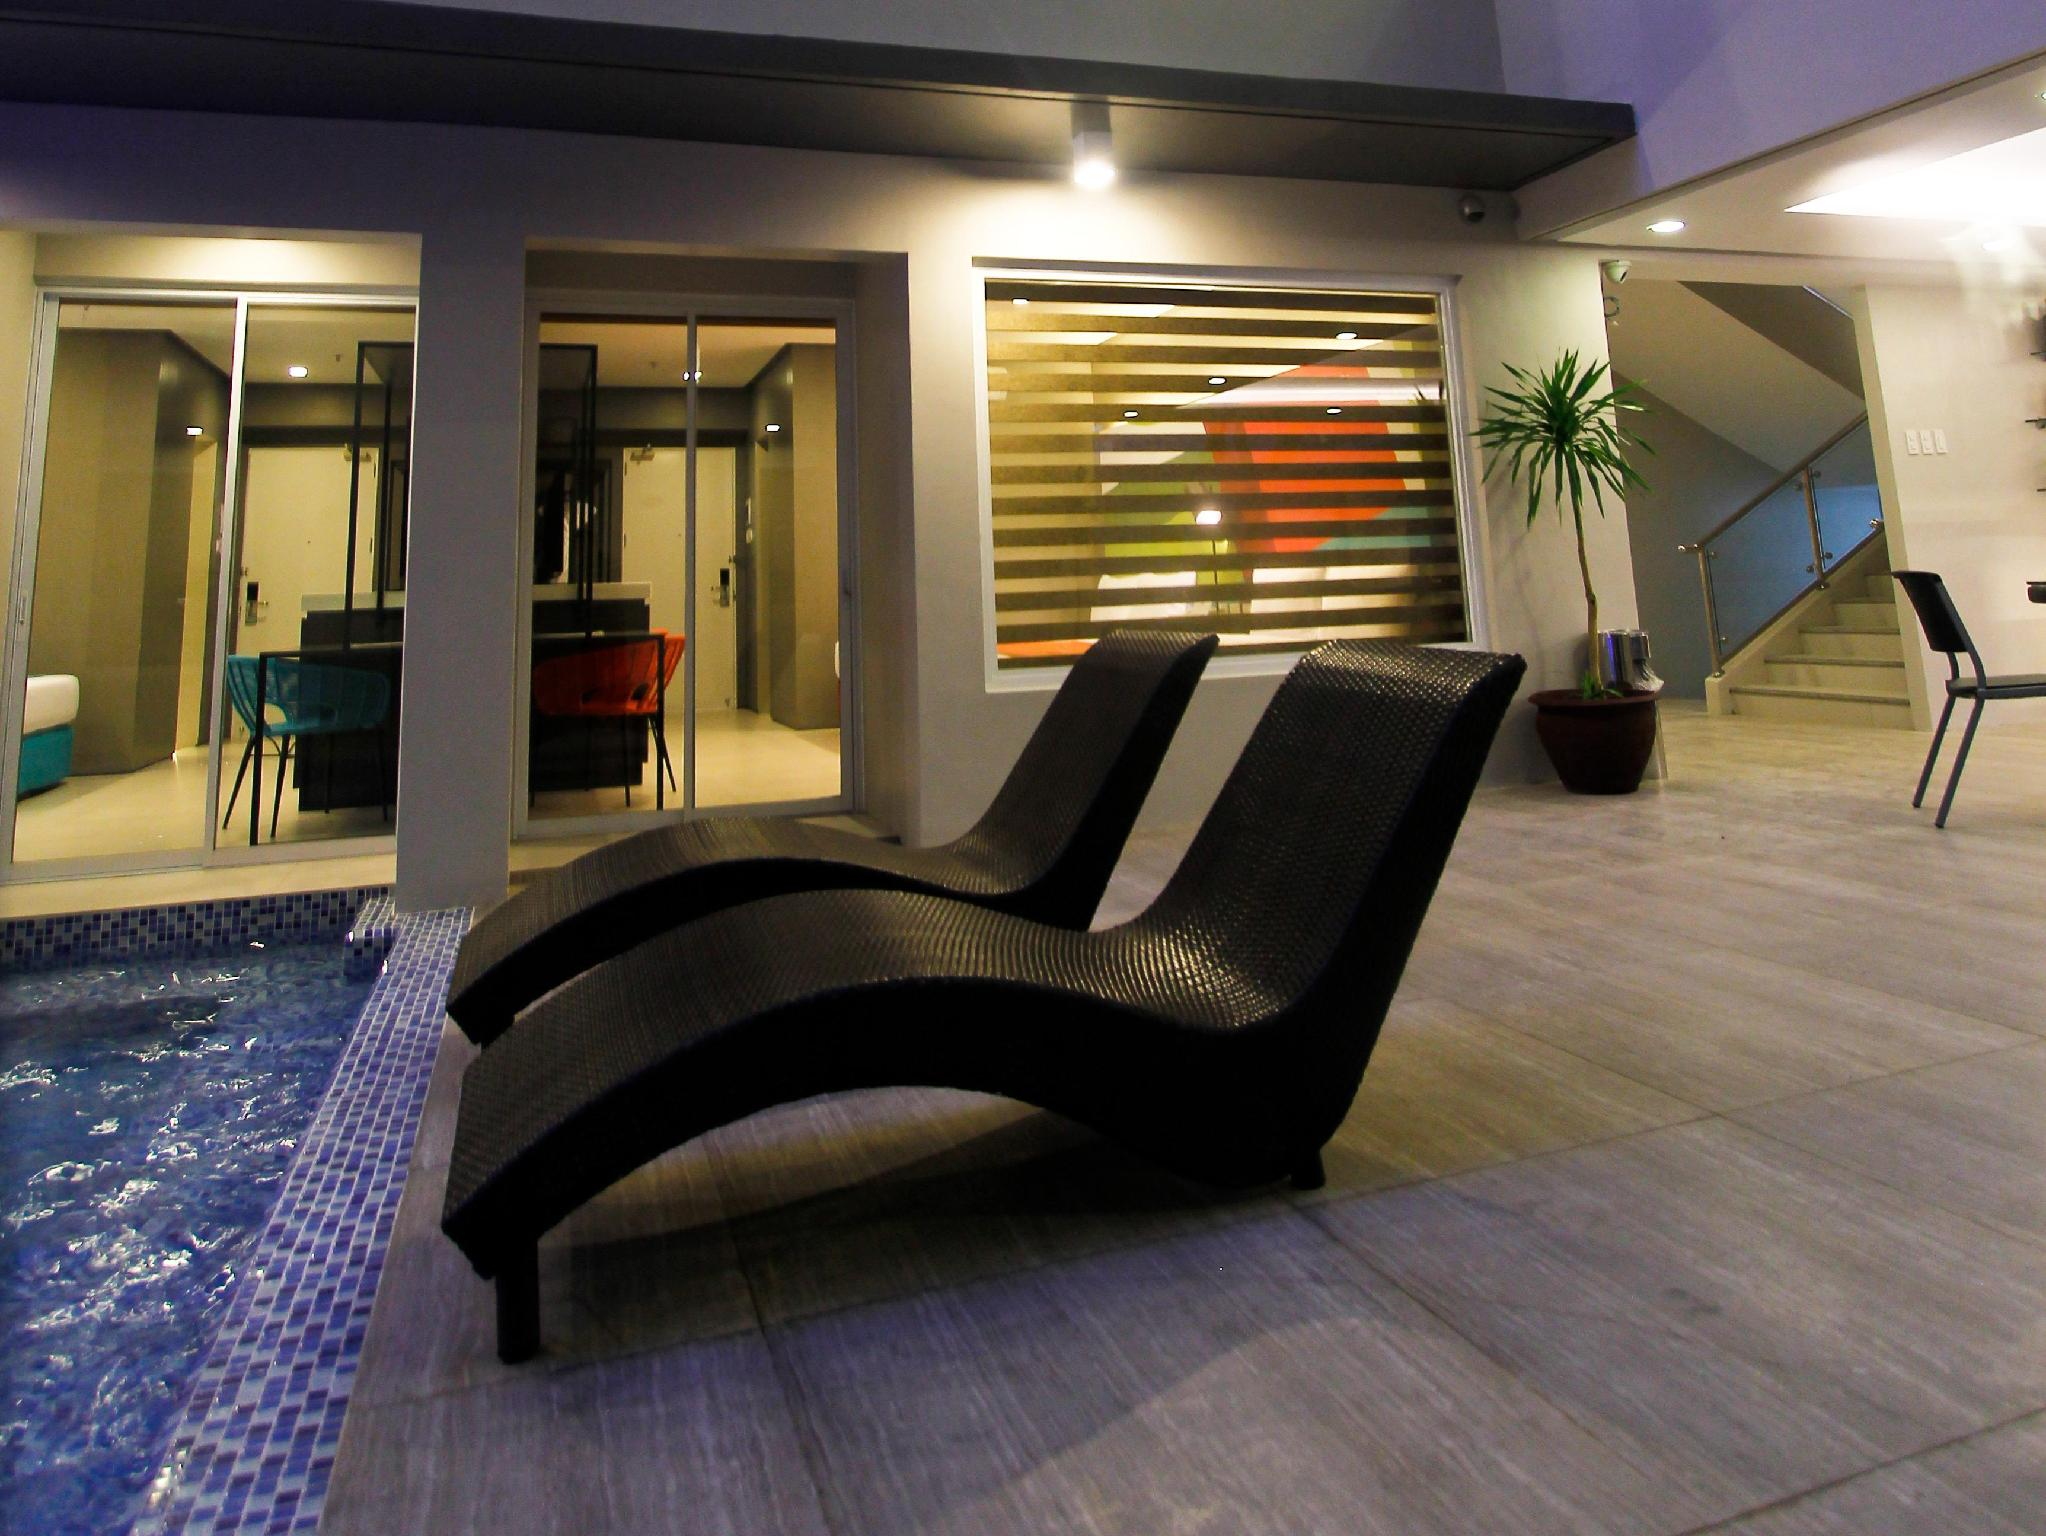 Boracay Uptown Hotel53